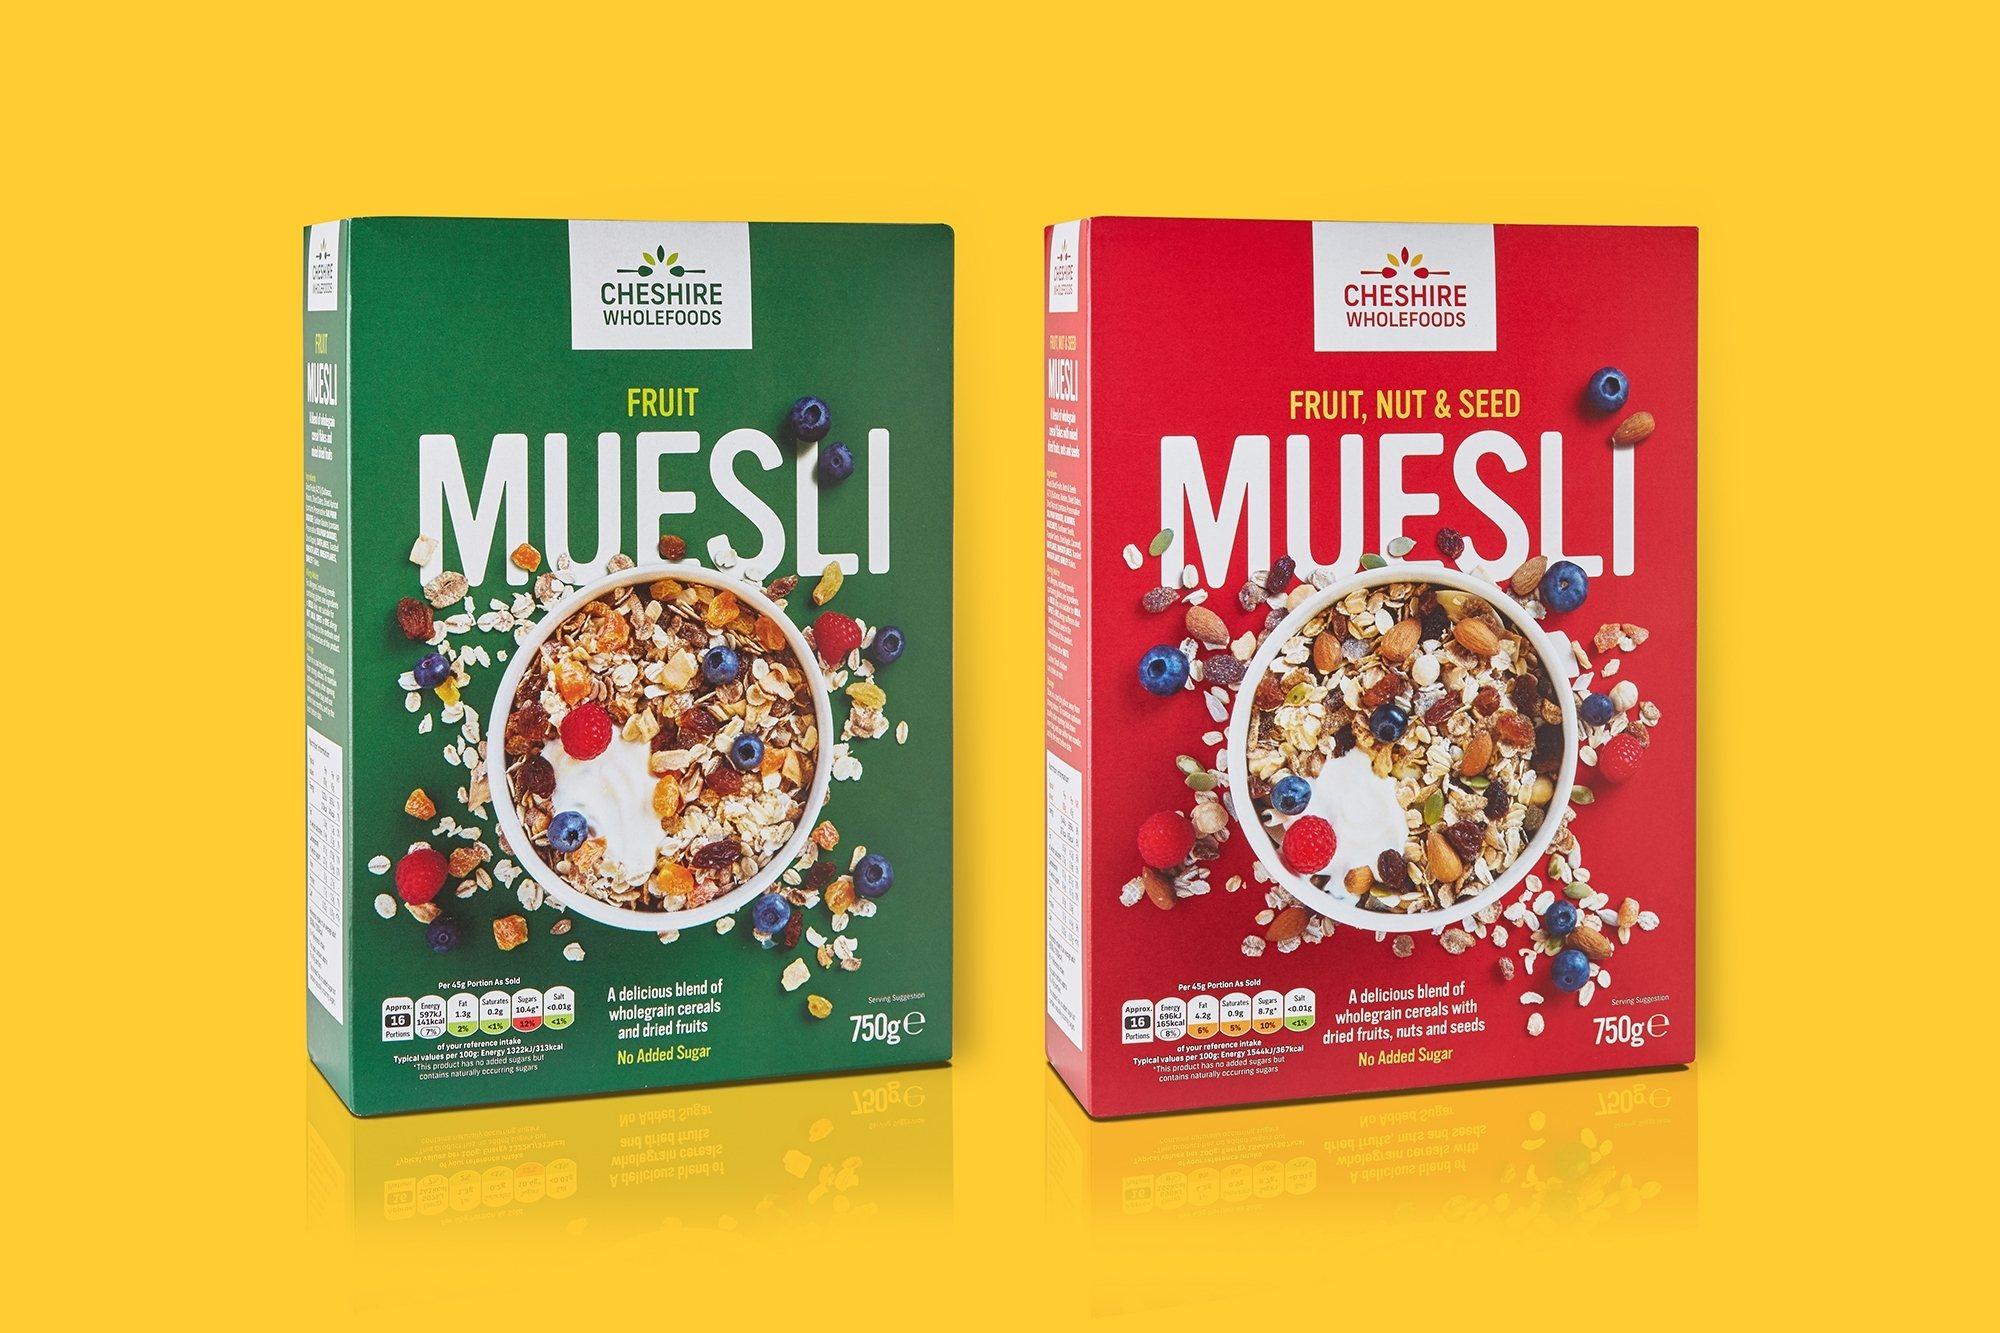 Design For Muesli Packaging